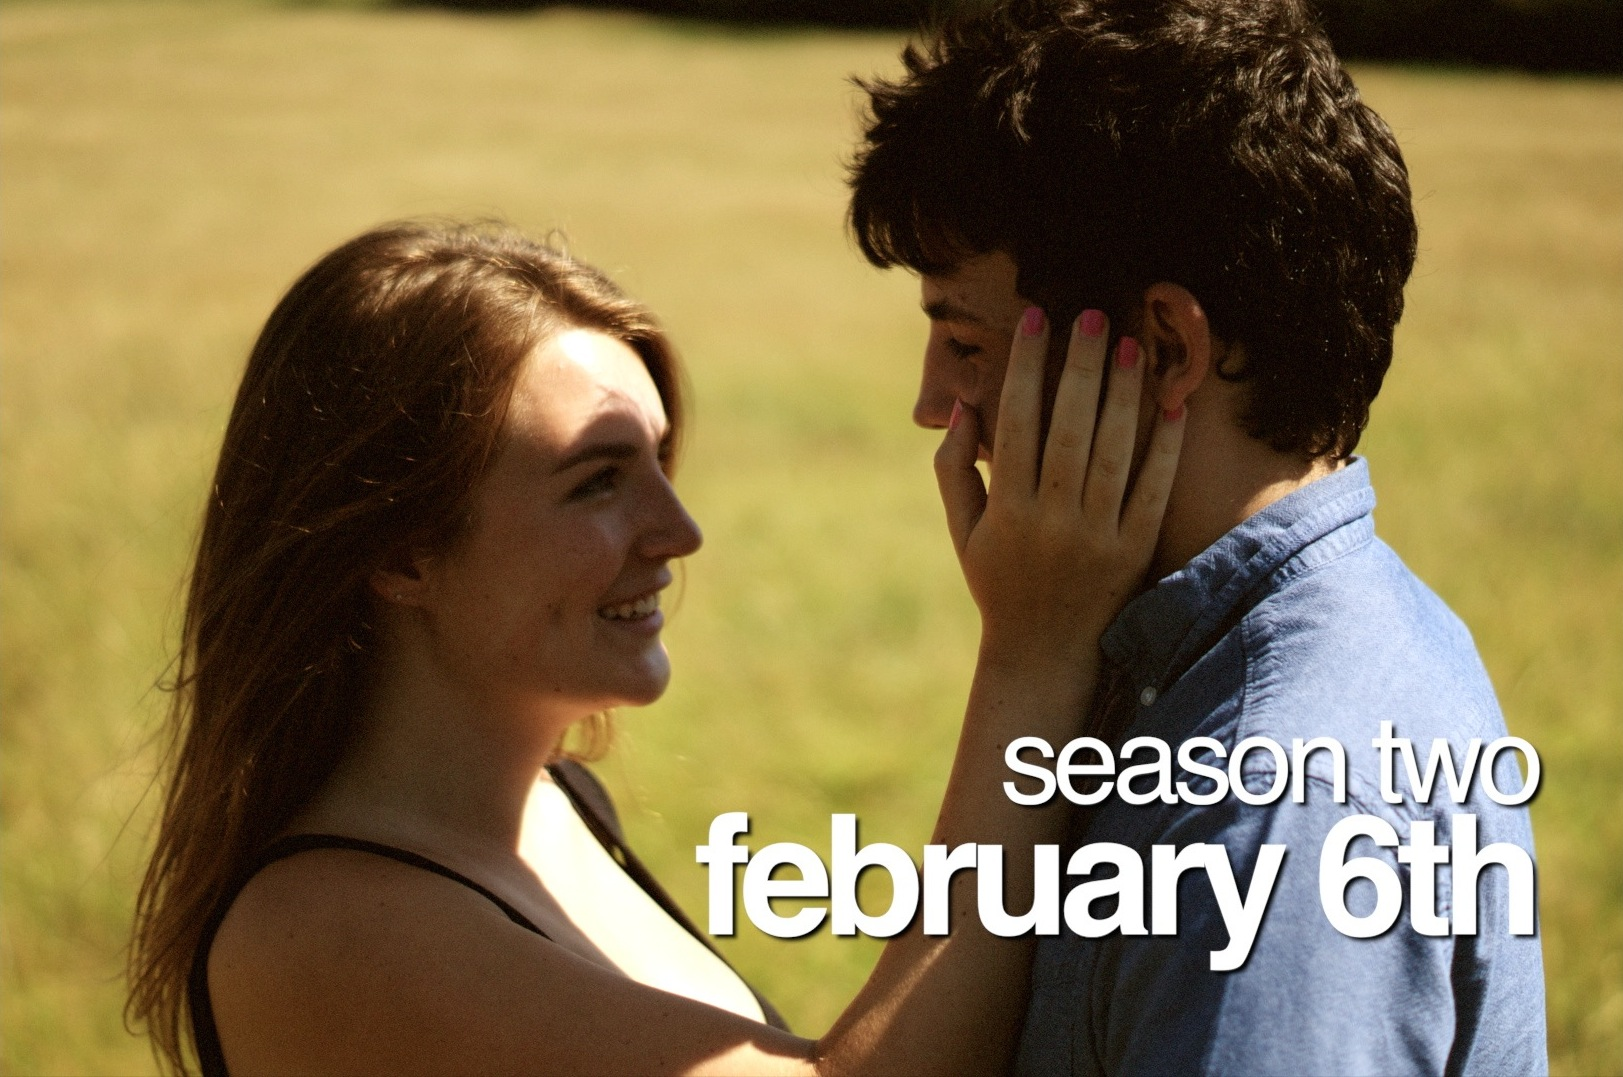 Season Two Premiere Date Announced!